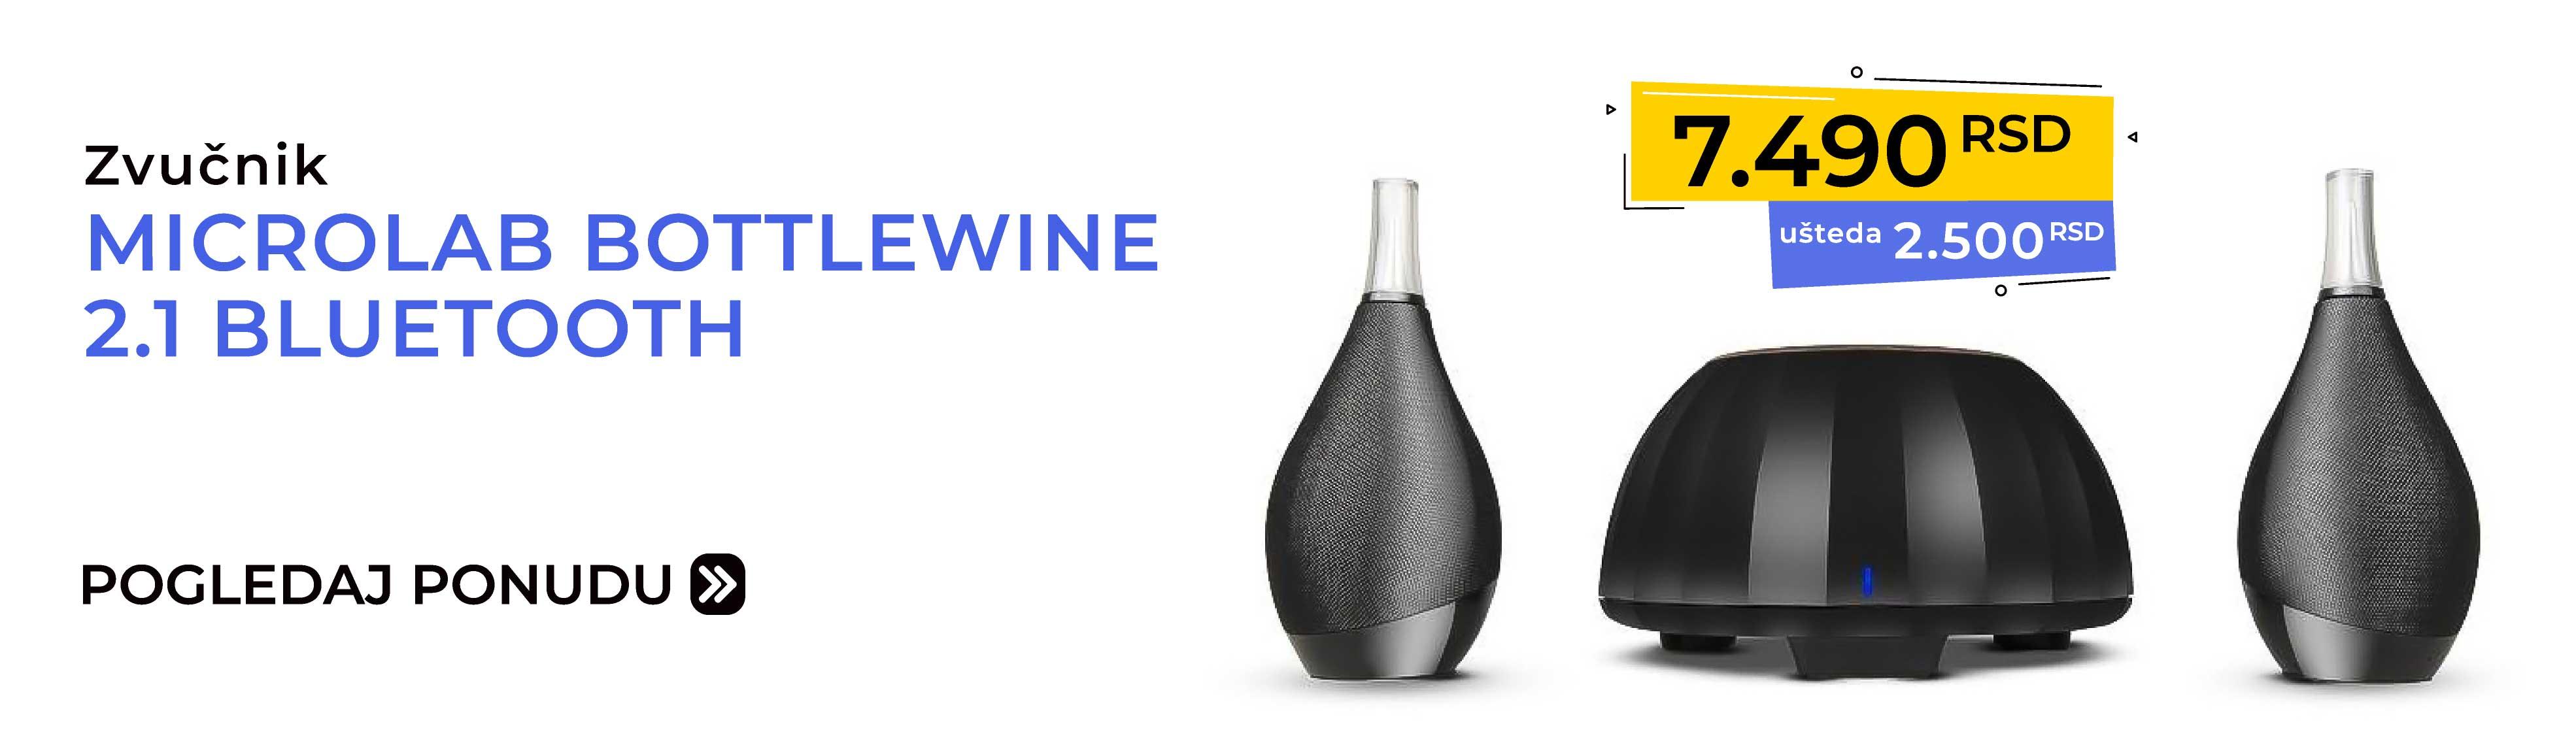 Microlab bottlewine